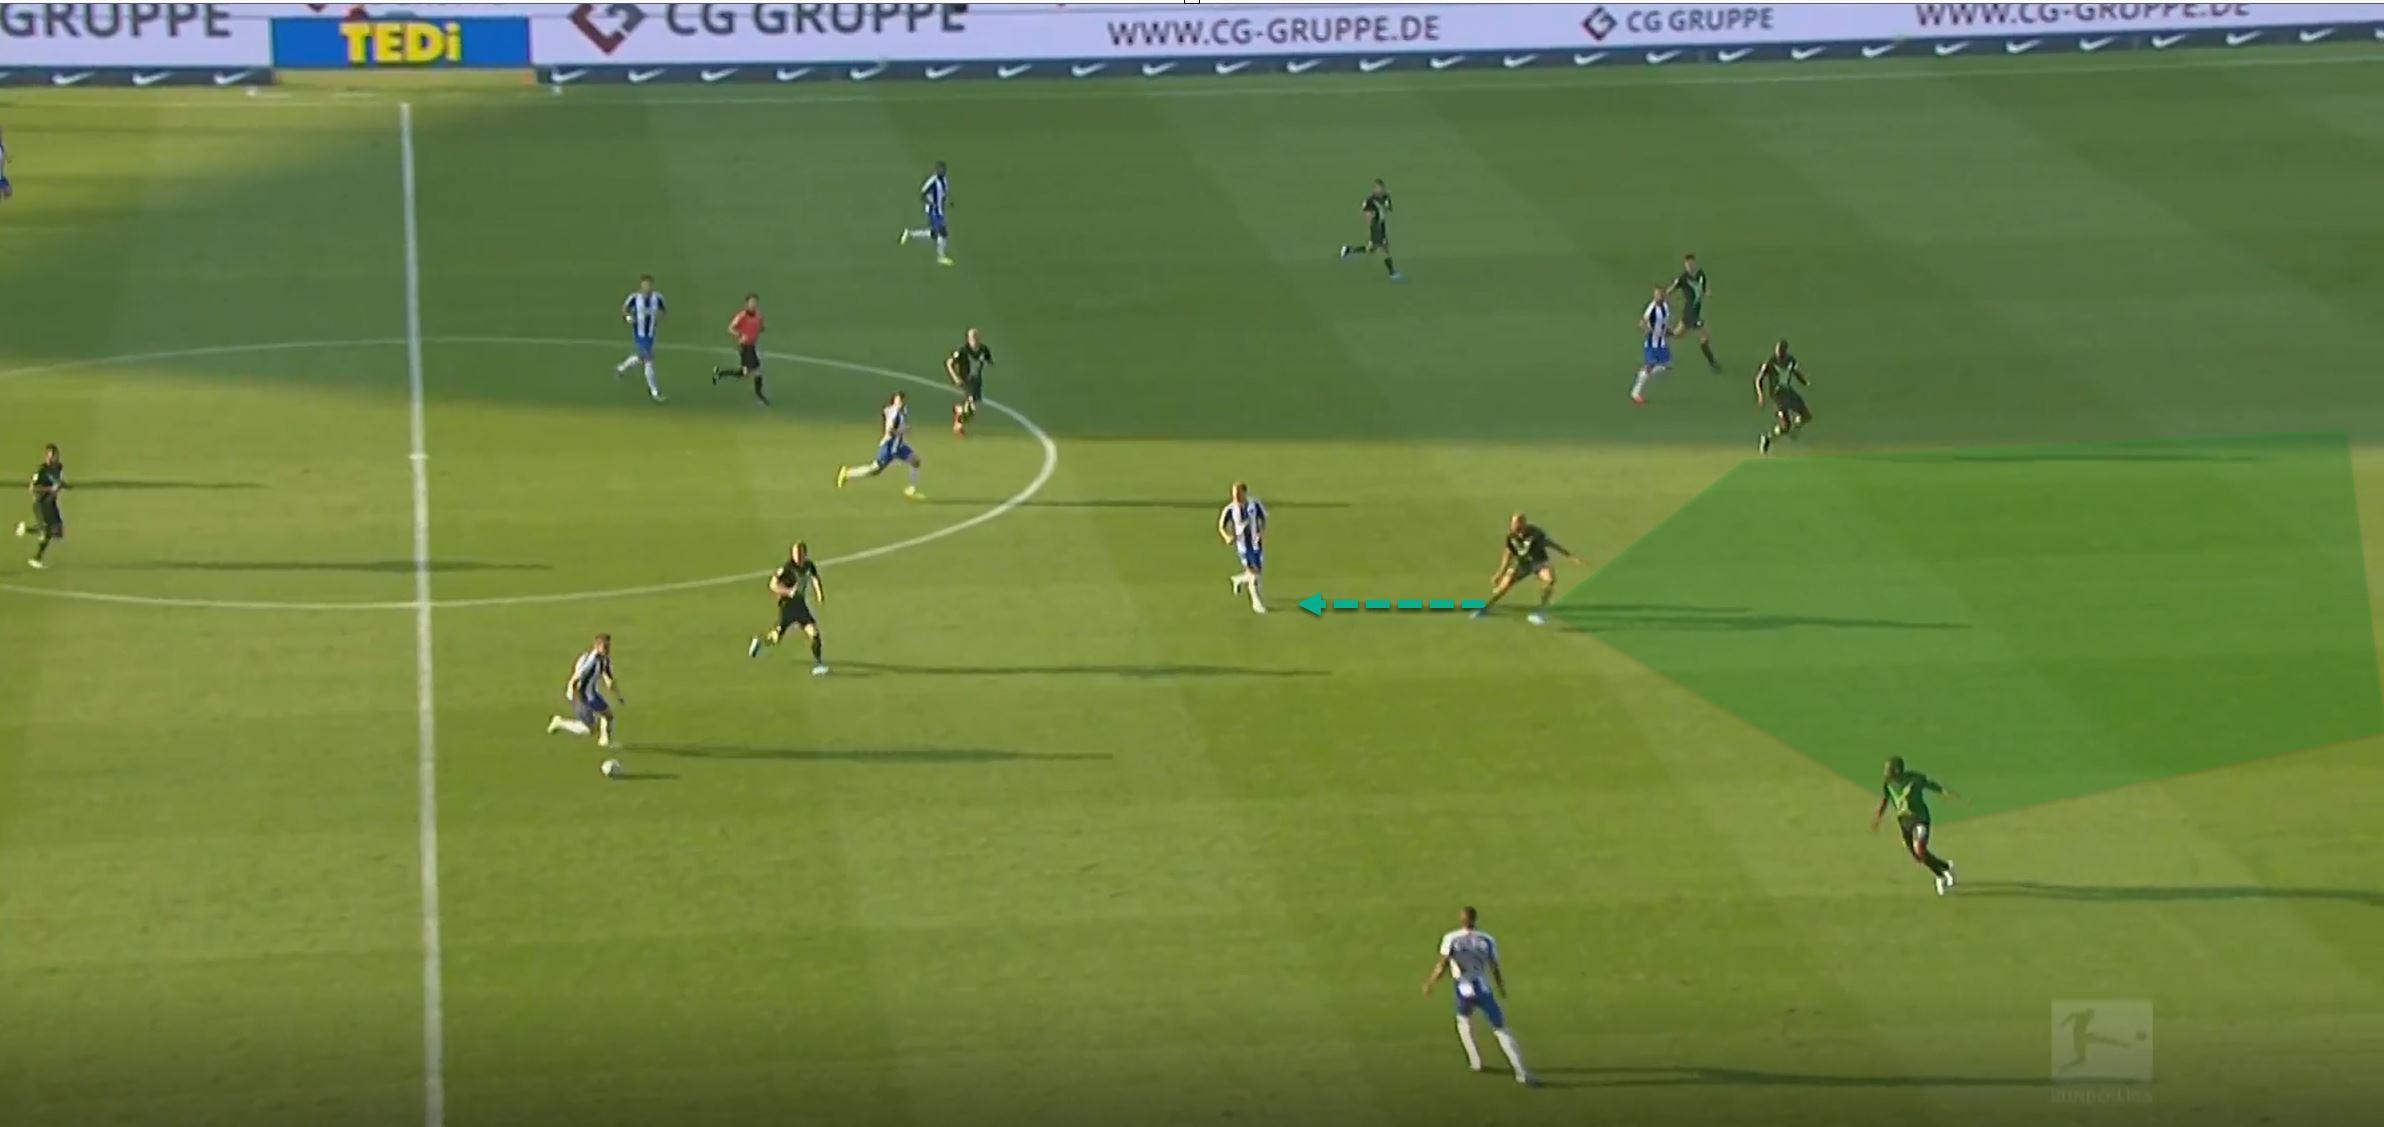 Bundesliga 2019/20: Hertha Berlin Wolfsburg- tactical analysis tactics